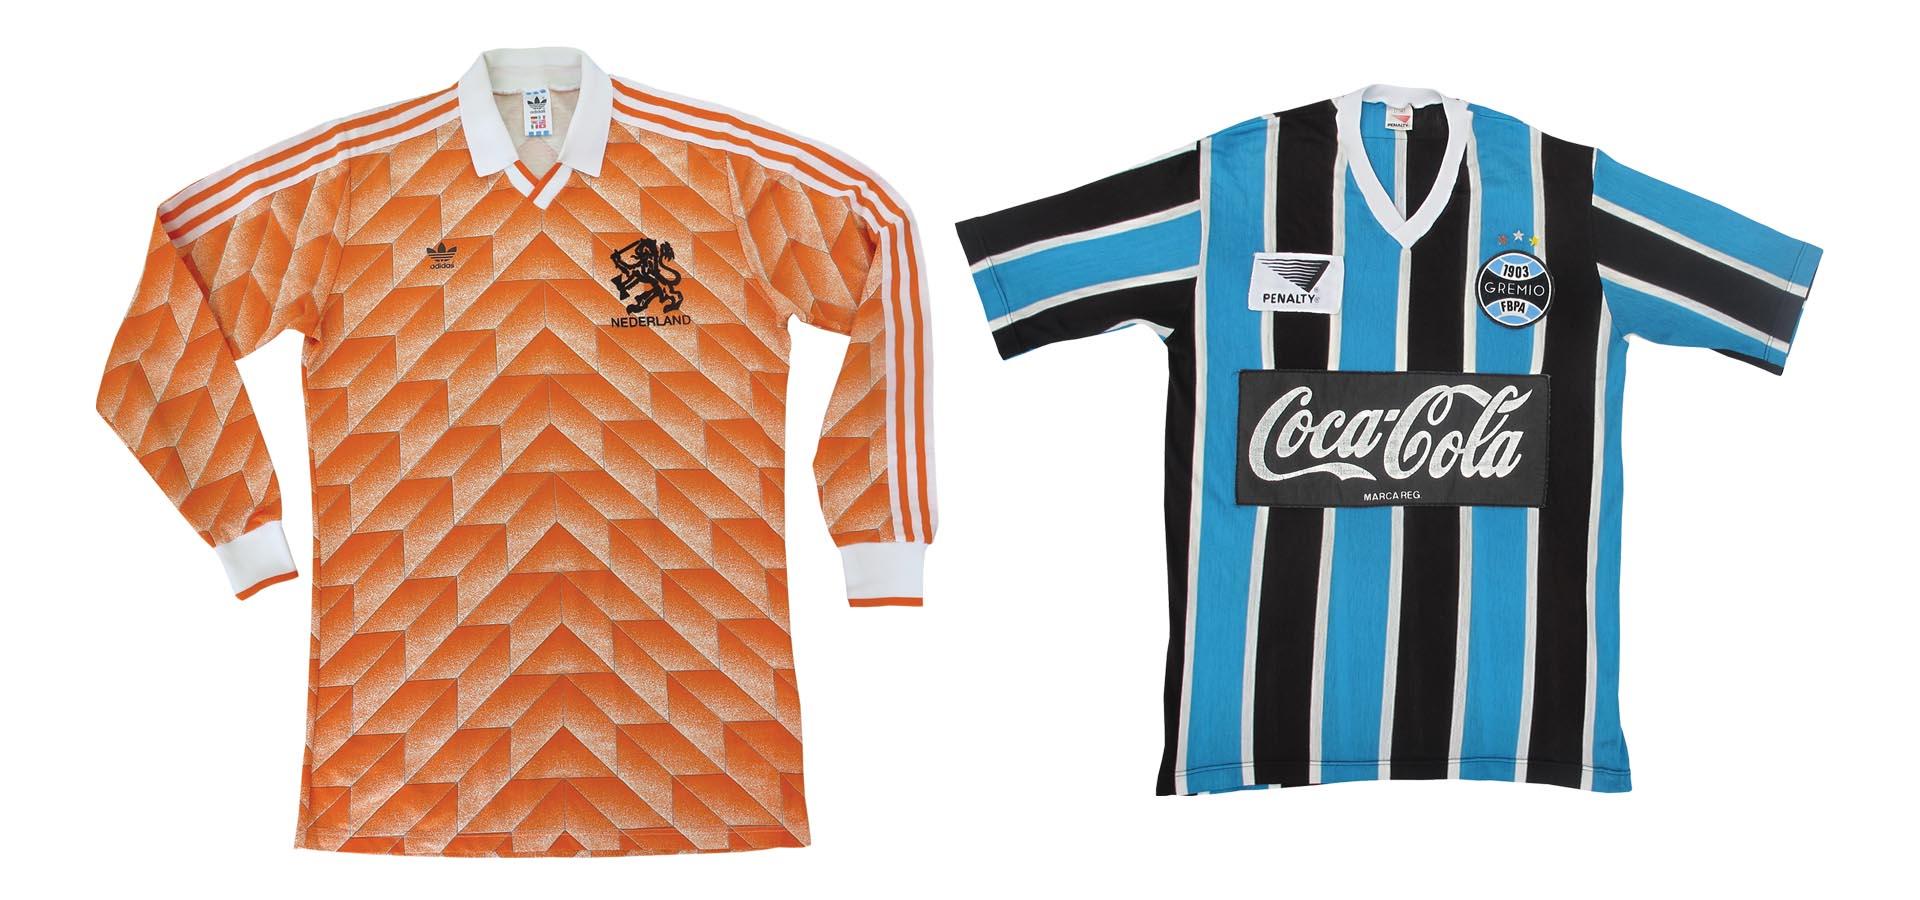 neal-heard-jacket-required-art-of-the-football-shirt_0004_holland-euro-1988-1